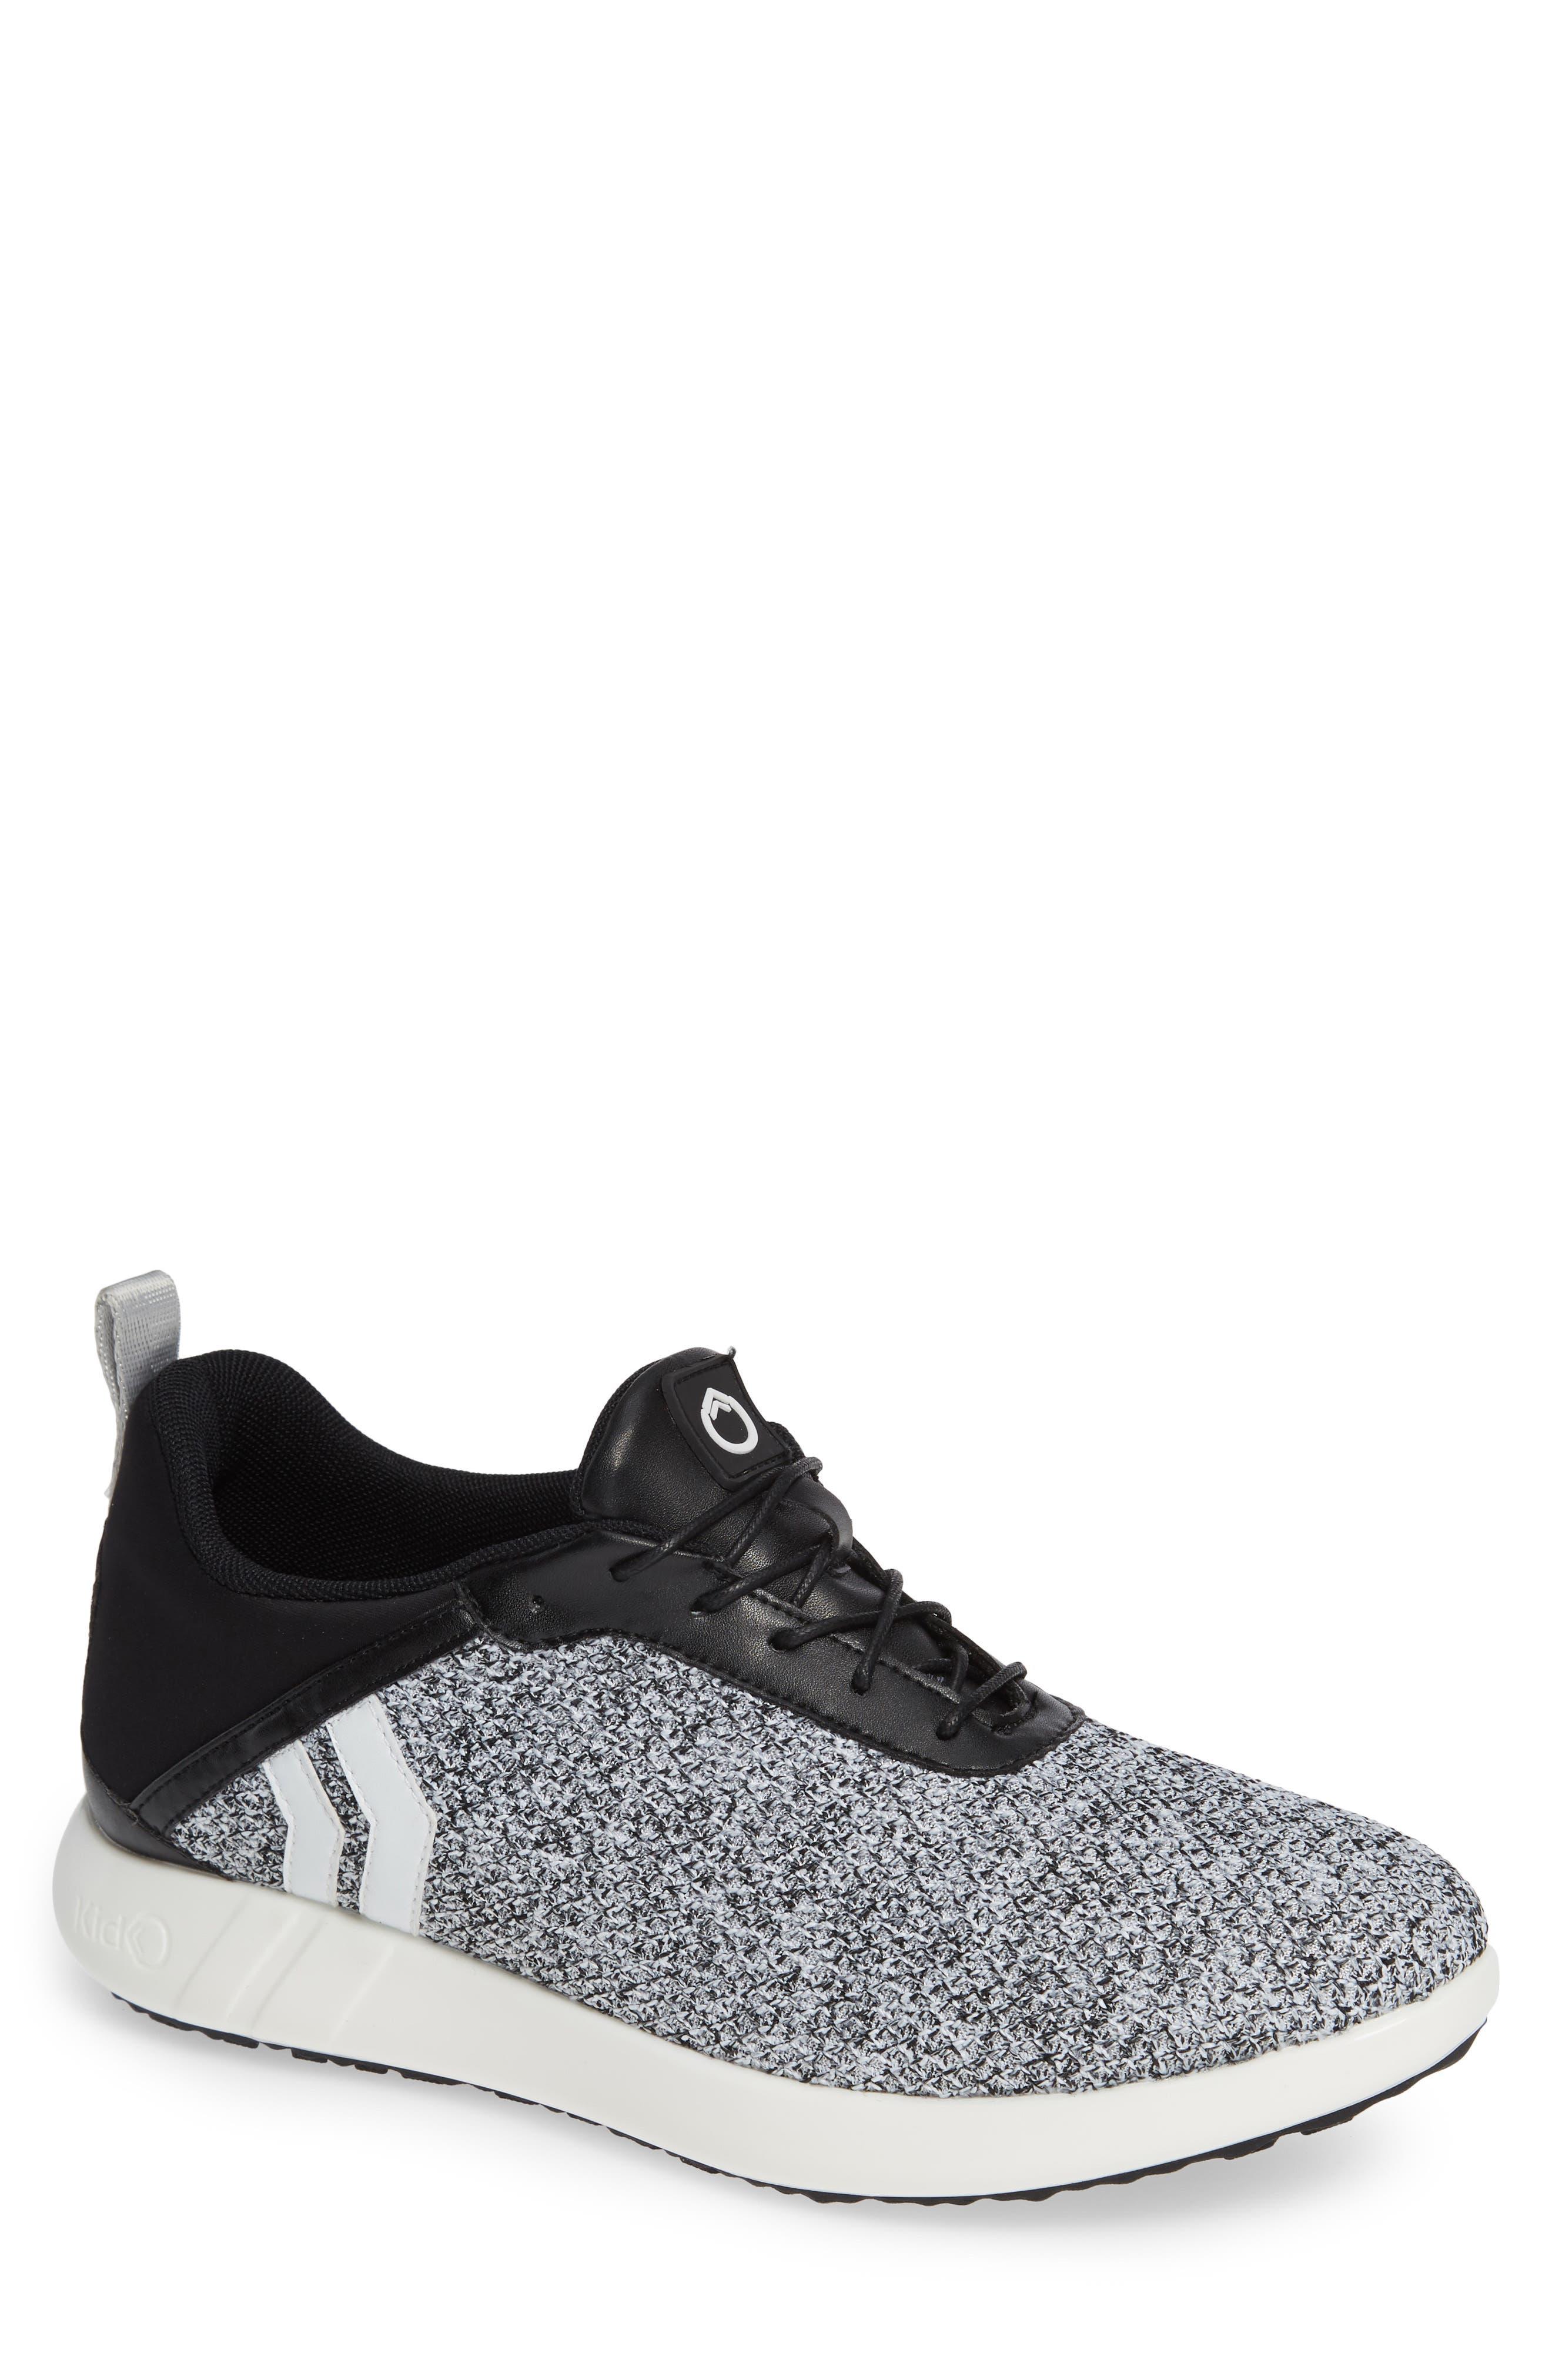 KICKO,                             Encore Sneaker,                             Main thumbnail 1, color,                             111